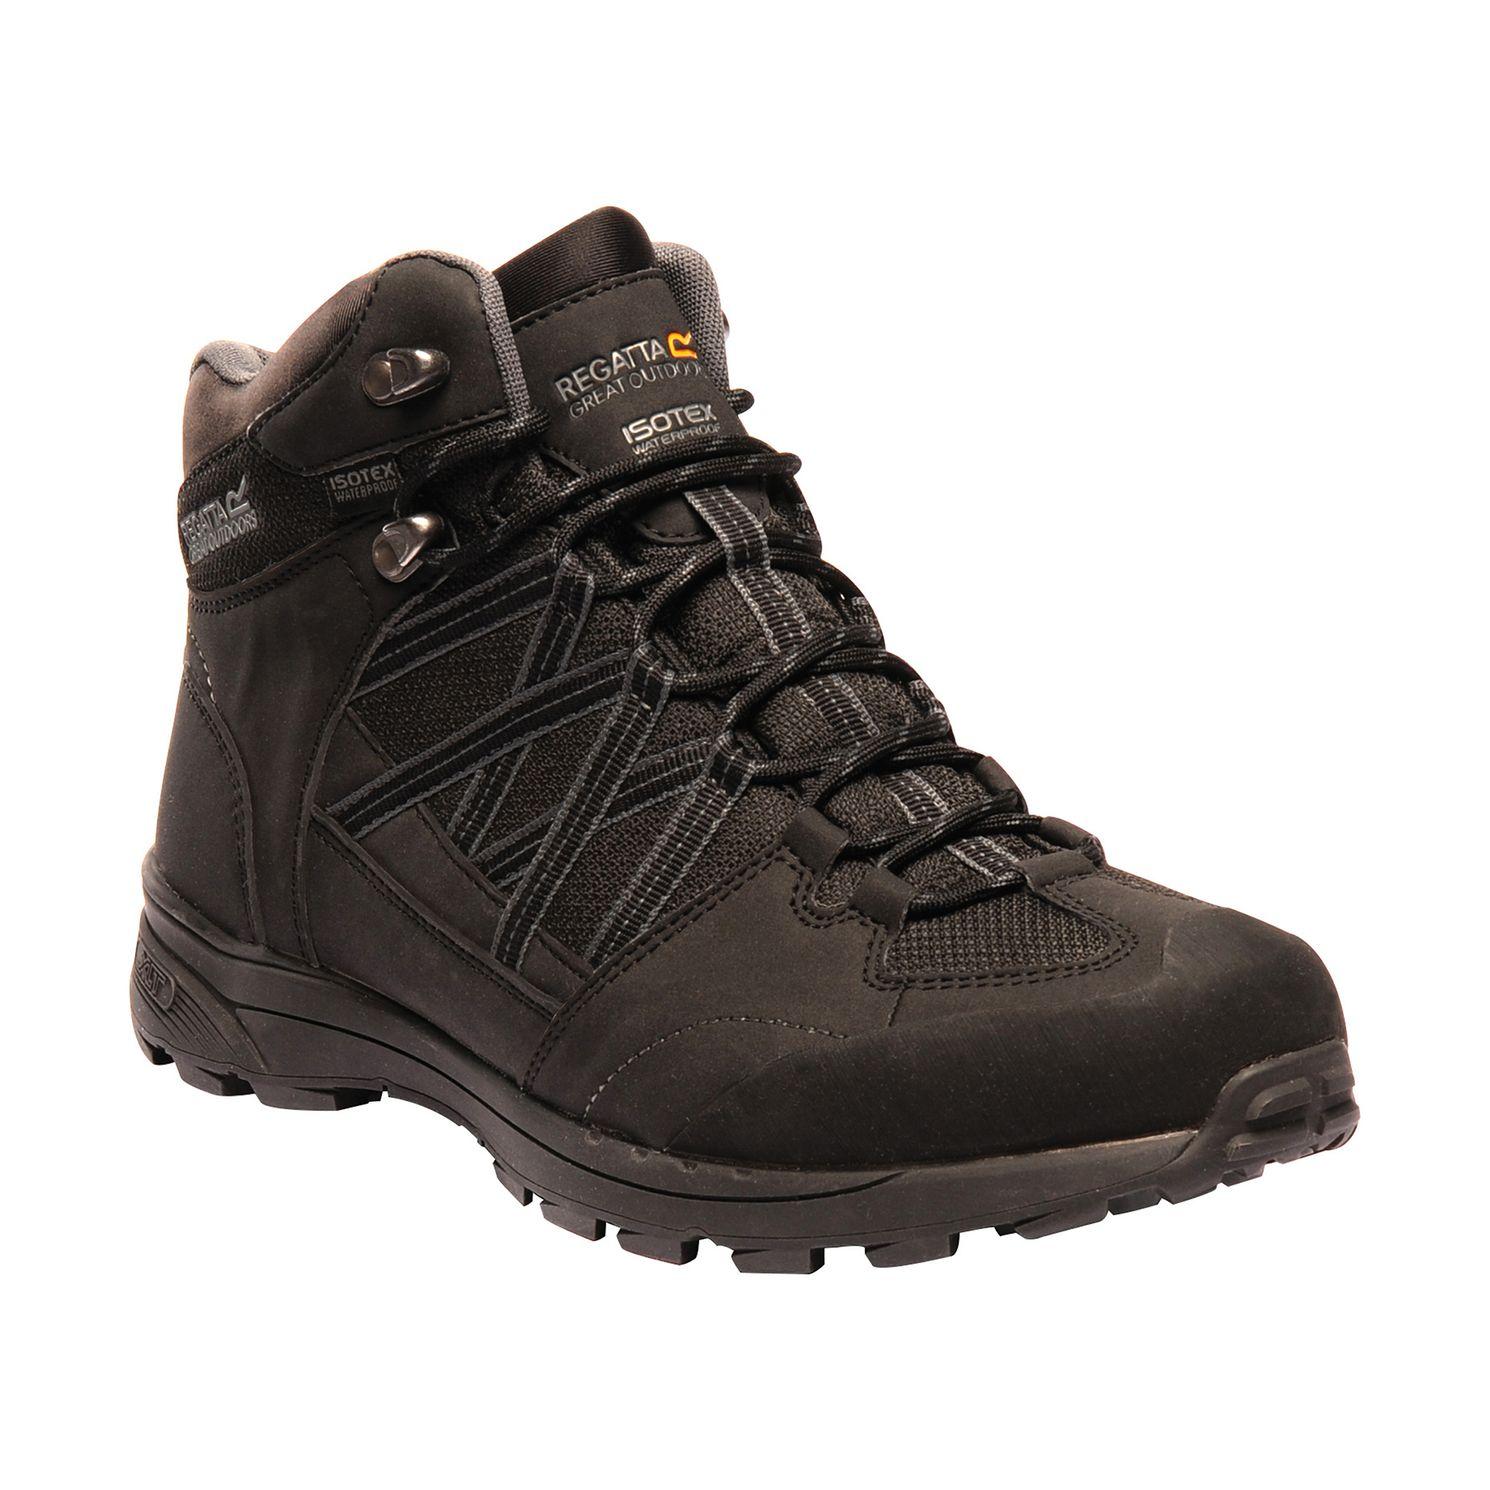 Men's black walking boot.